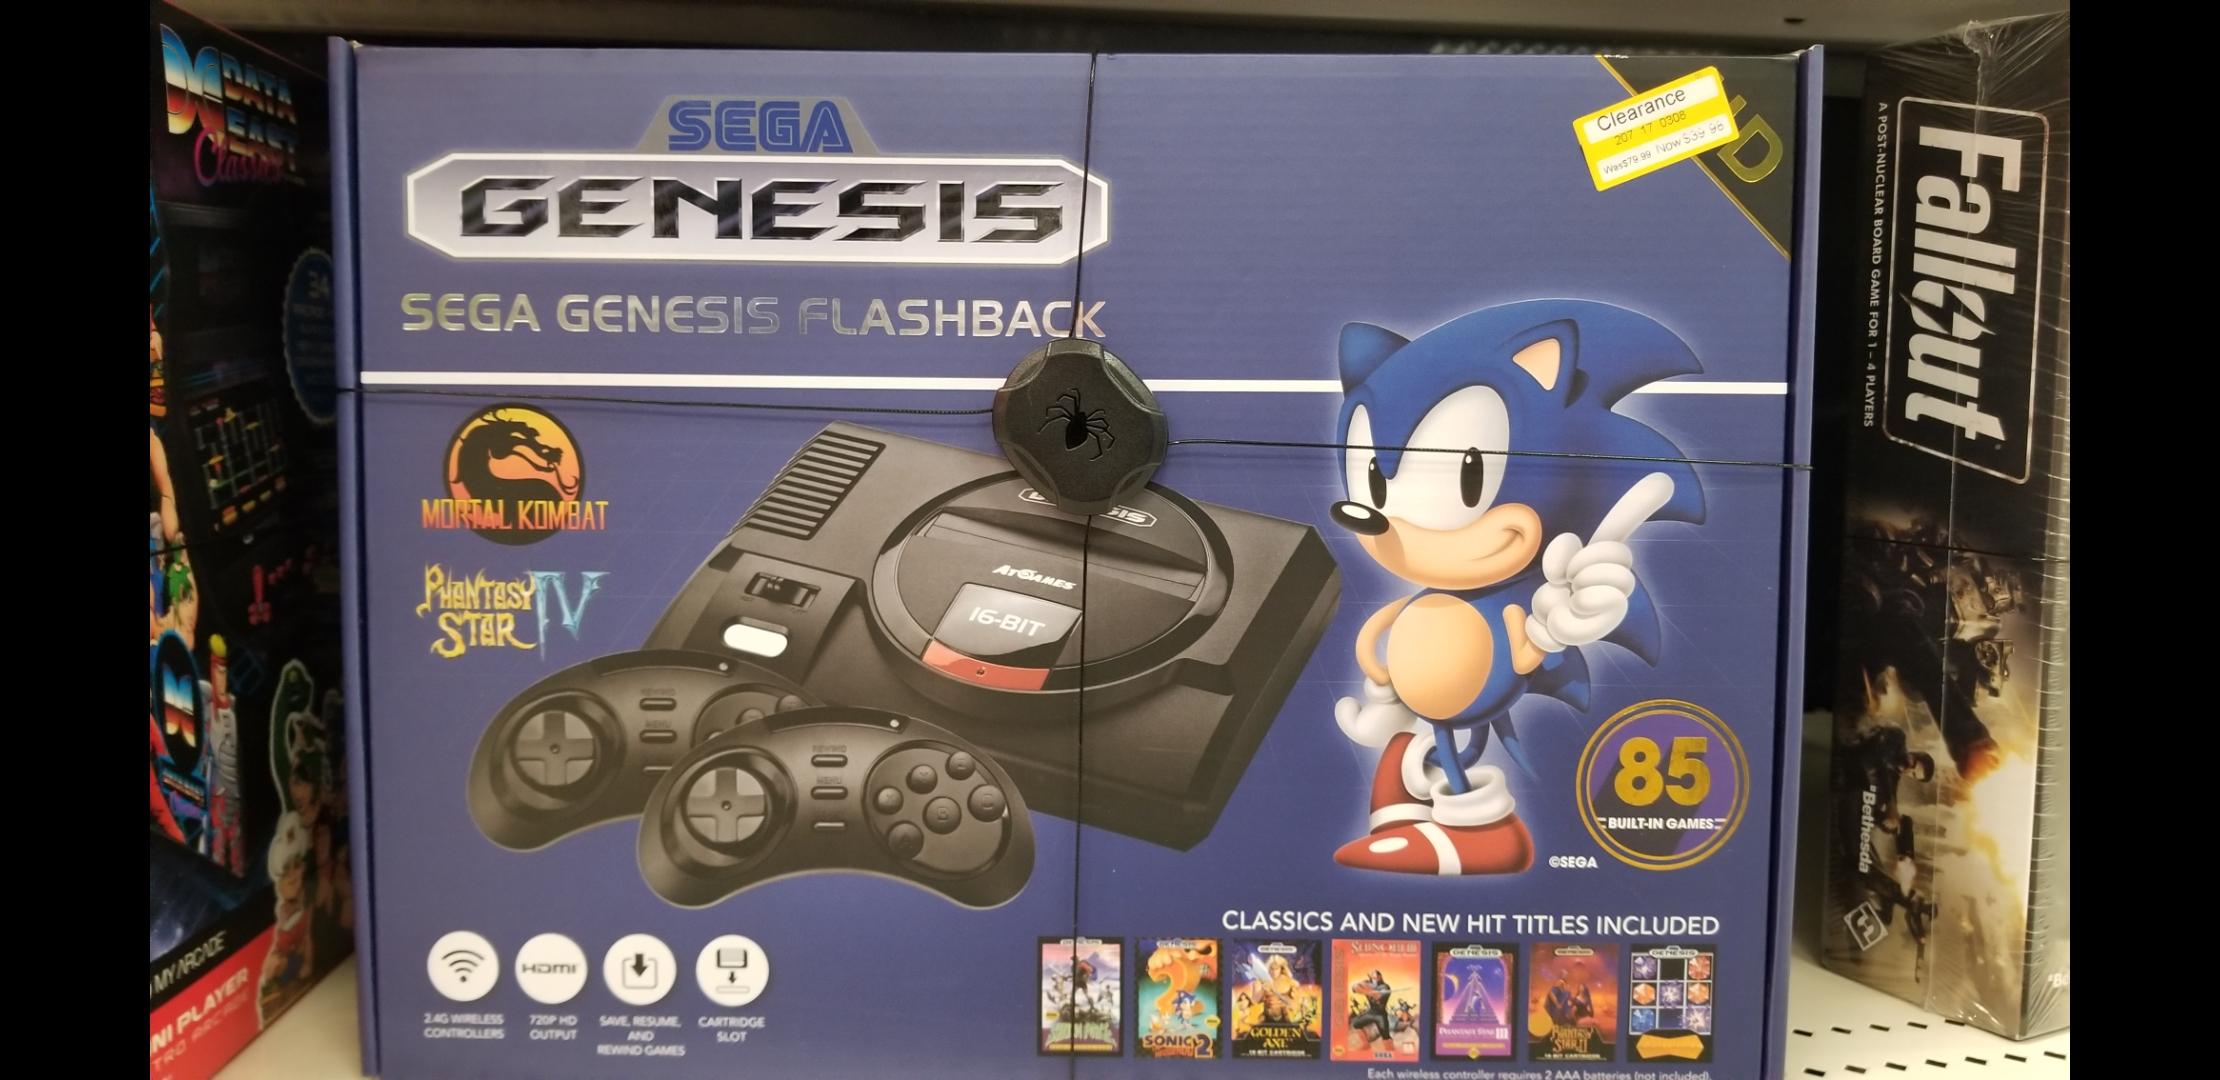 B&M YMMV Target Clearance: Sega Genesis Flashback game console $39.99